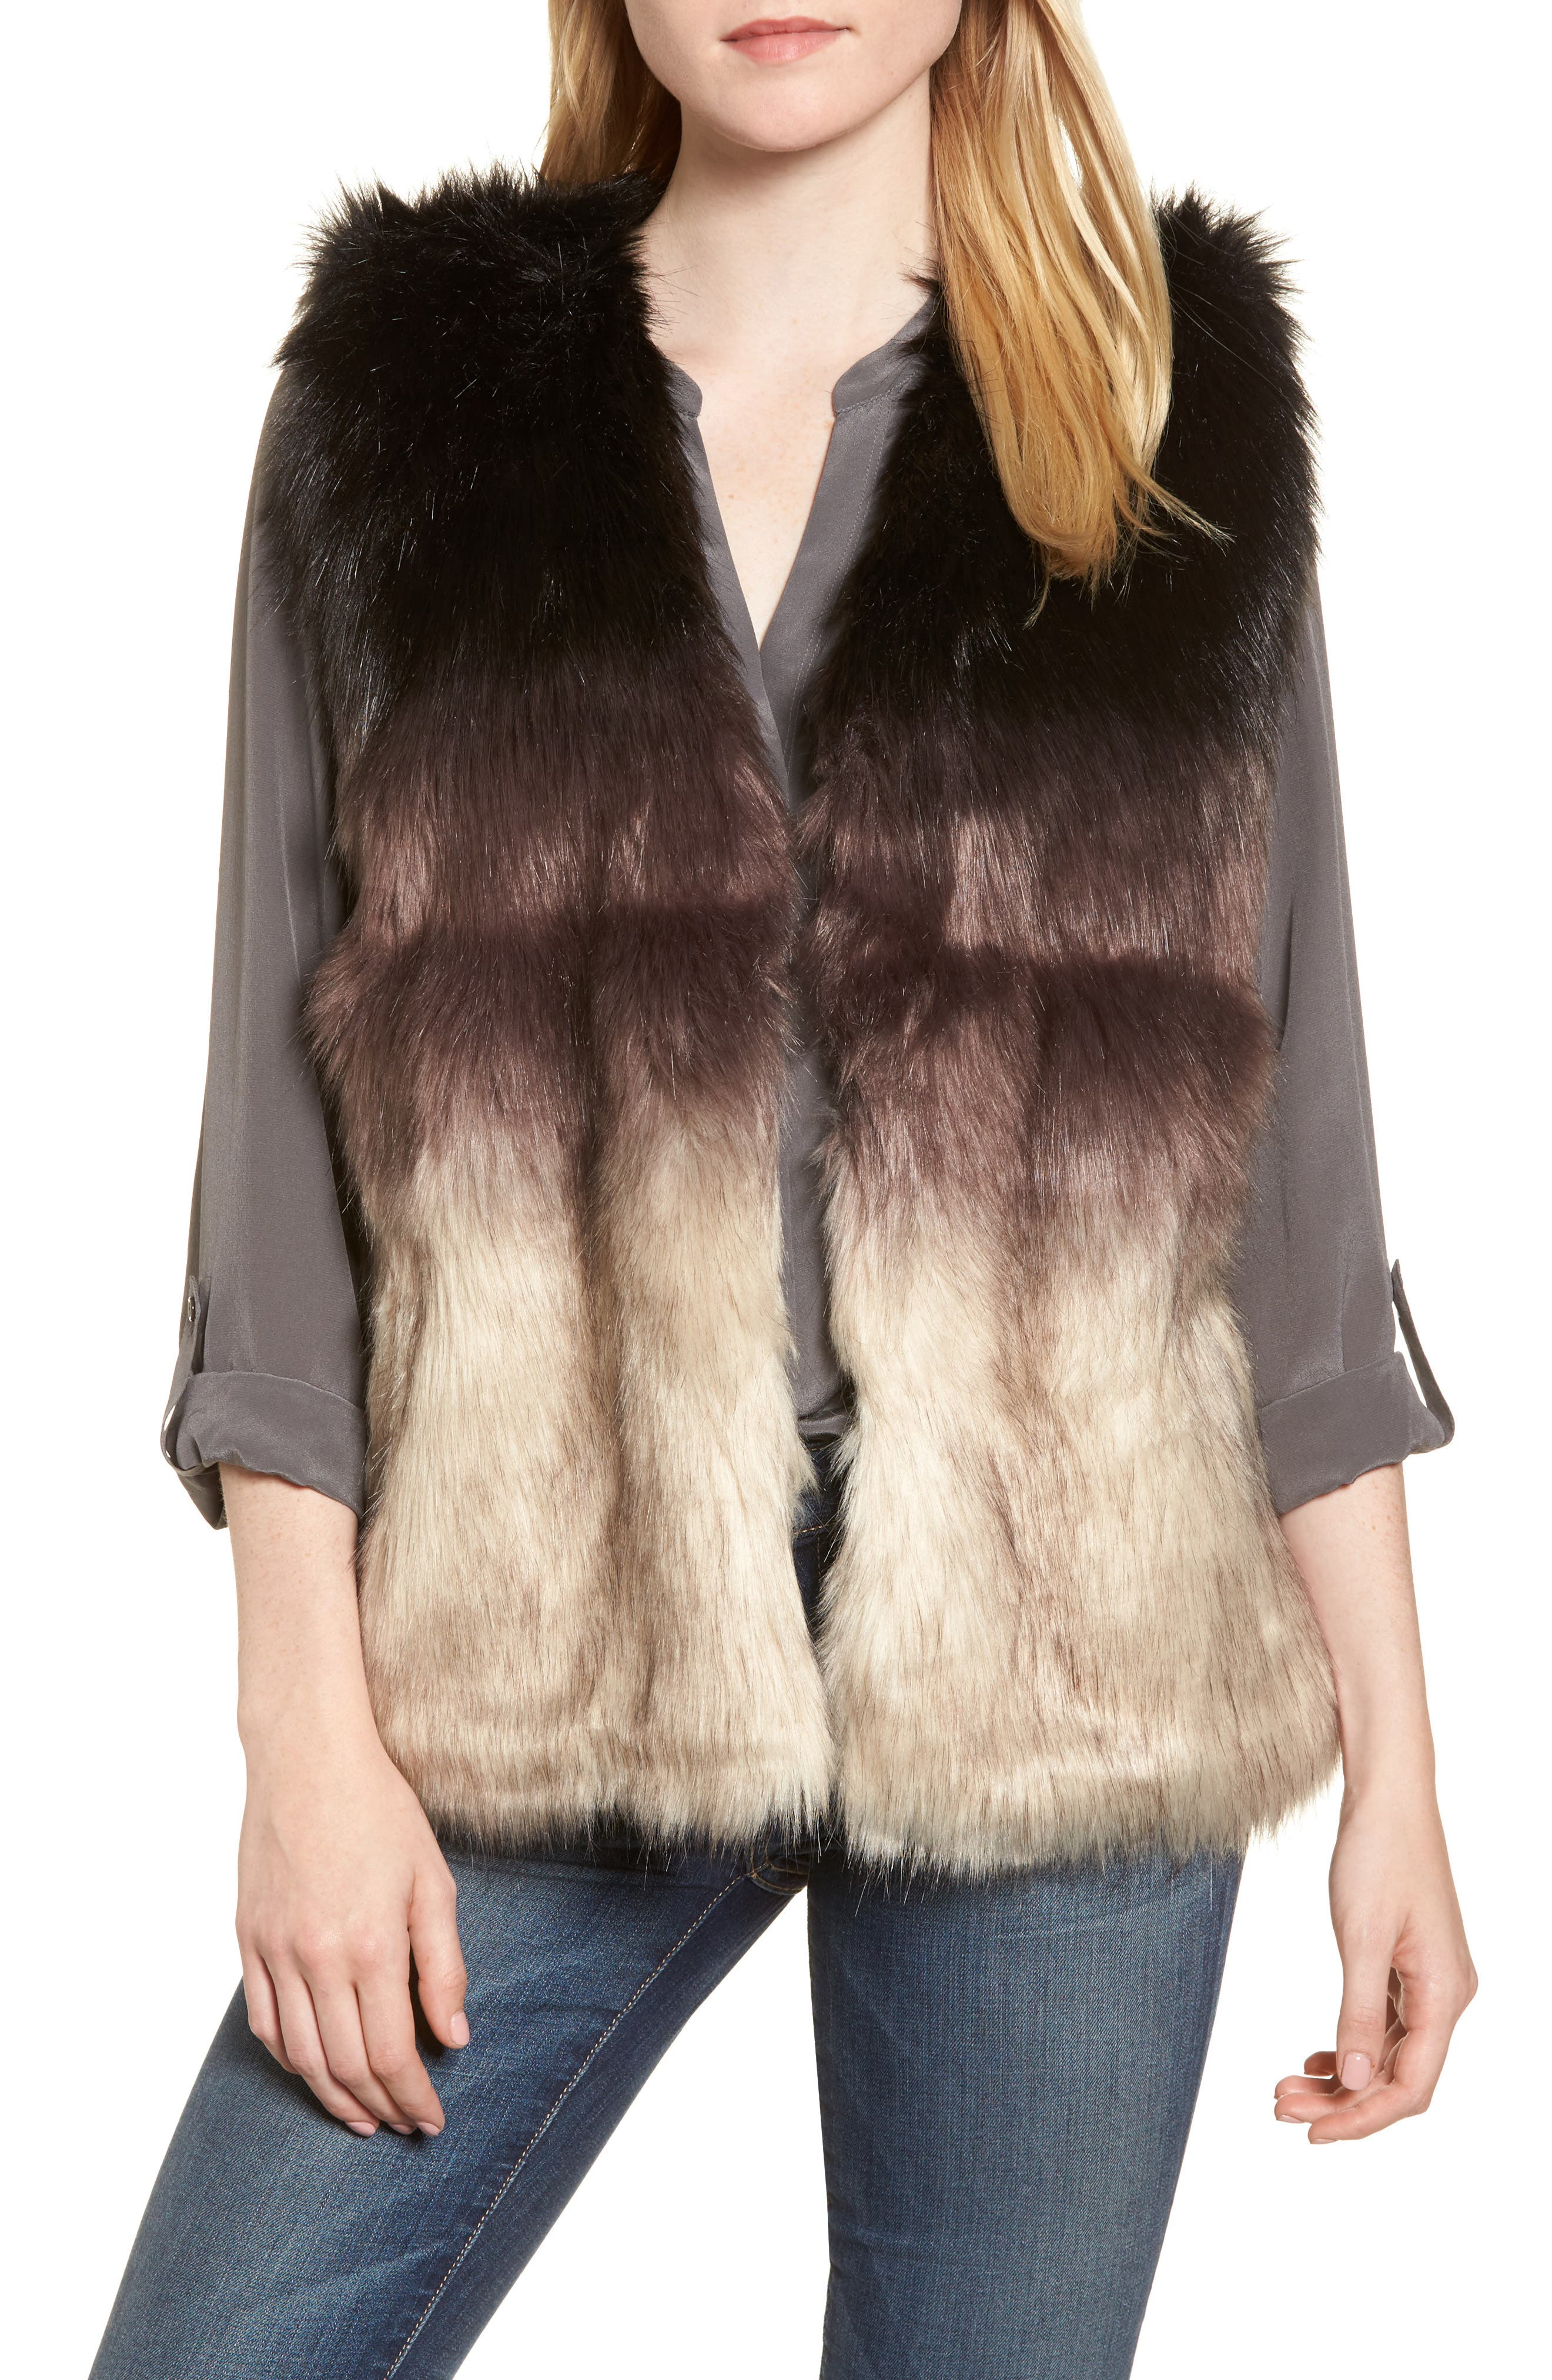 Alternate Image 1 Selected - Sole Society Ombré Faux Fur Vest